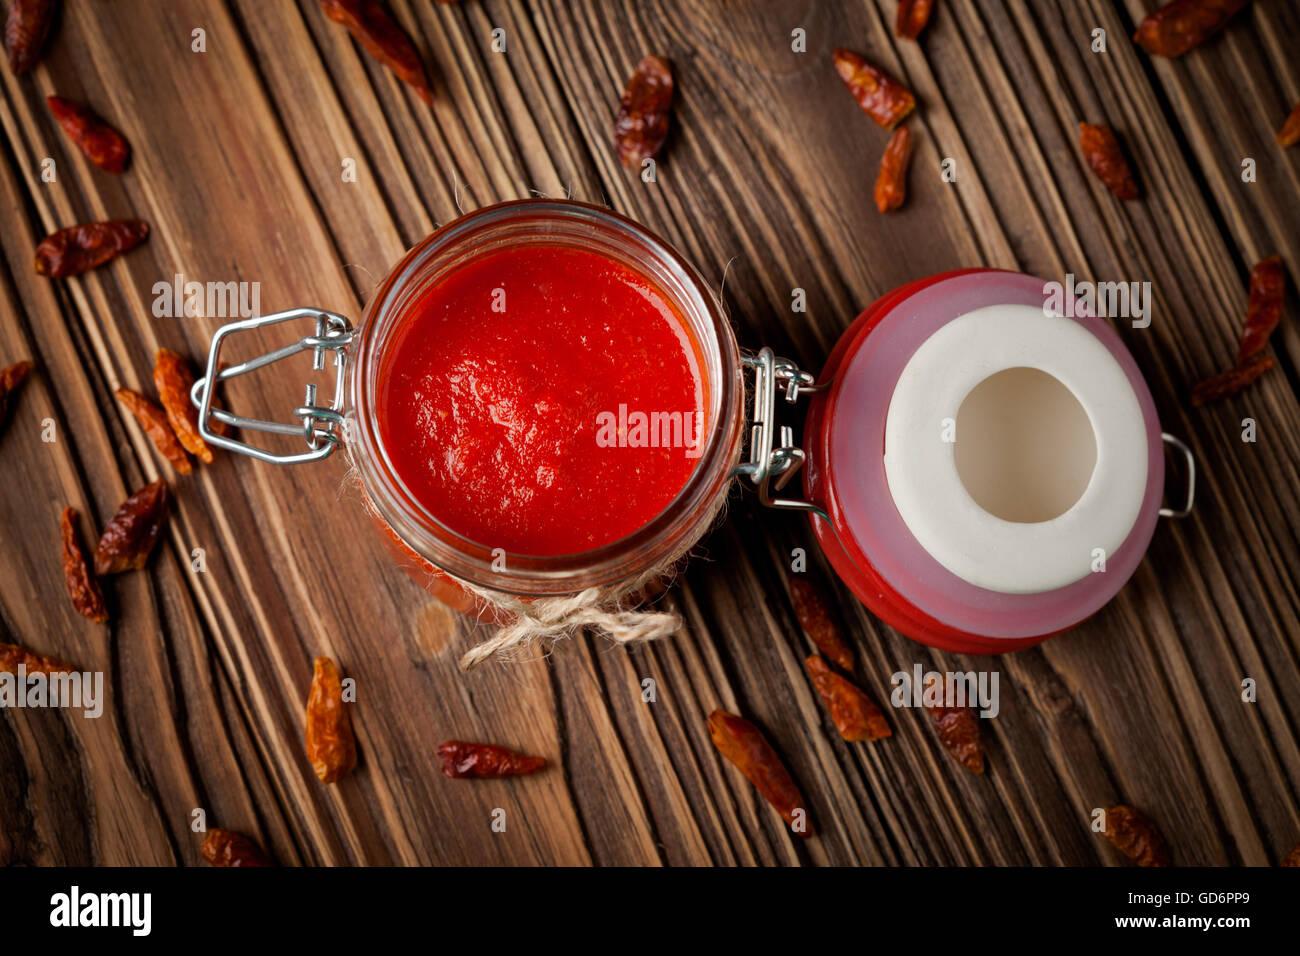 Natural diy chilli sauce sriracha - Stock Image